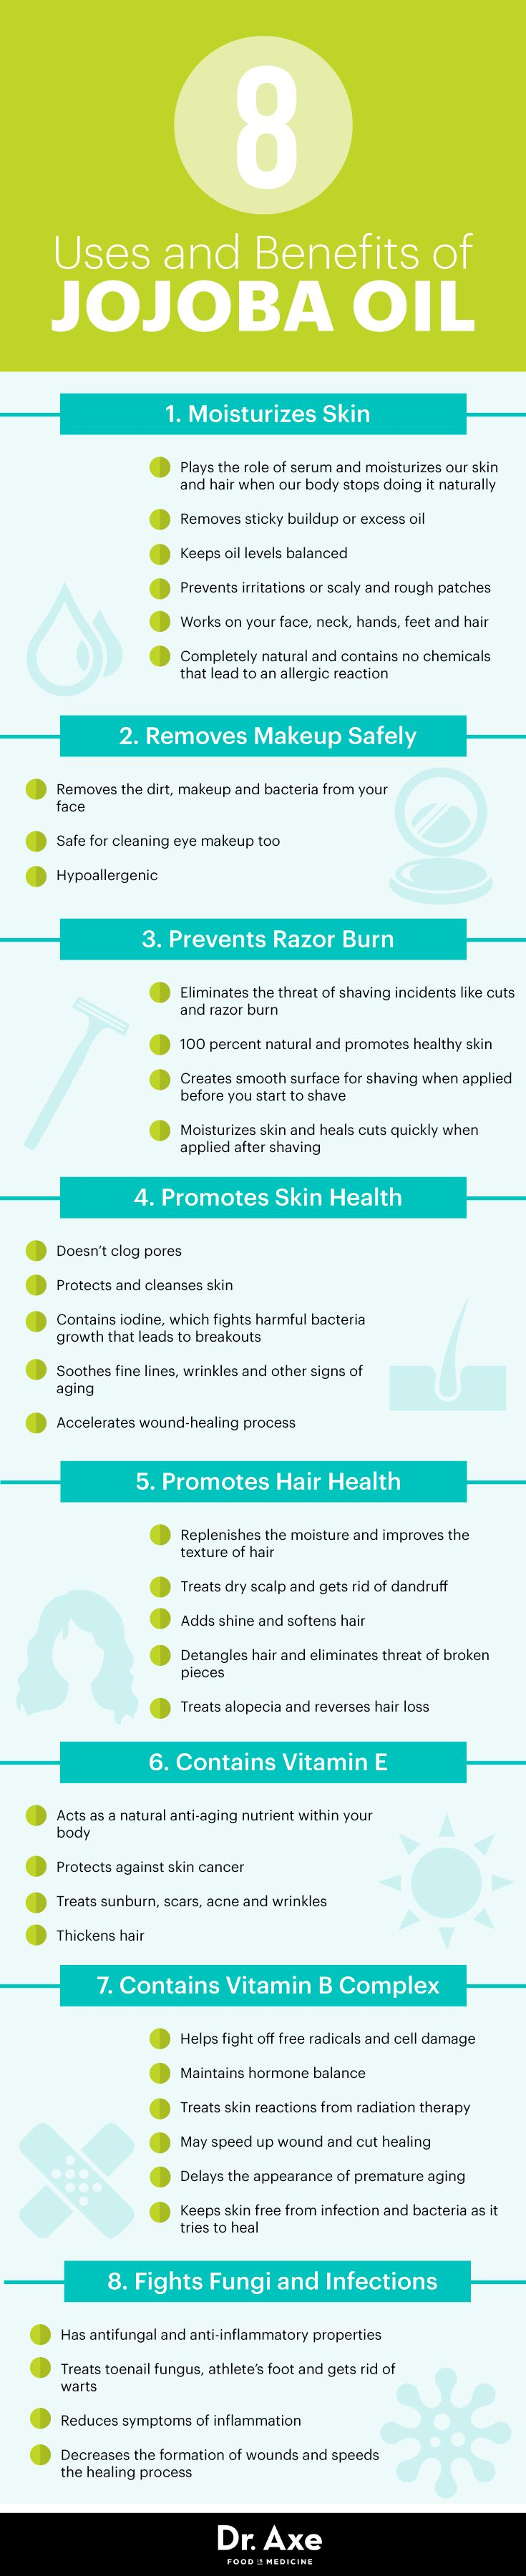 Jojoba Oil Benefits for Face, Hair, Body and More - Dr. Axe